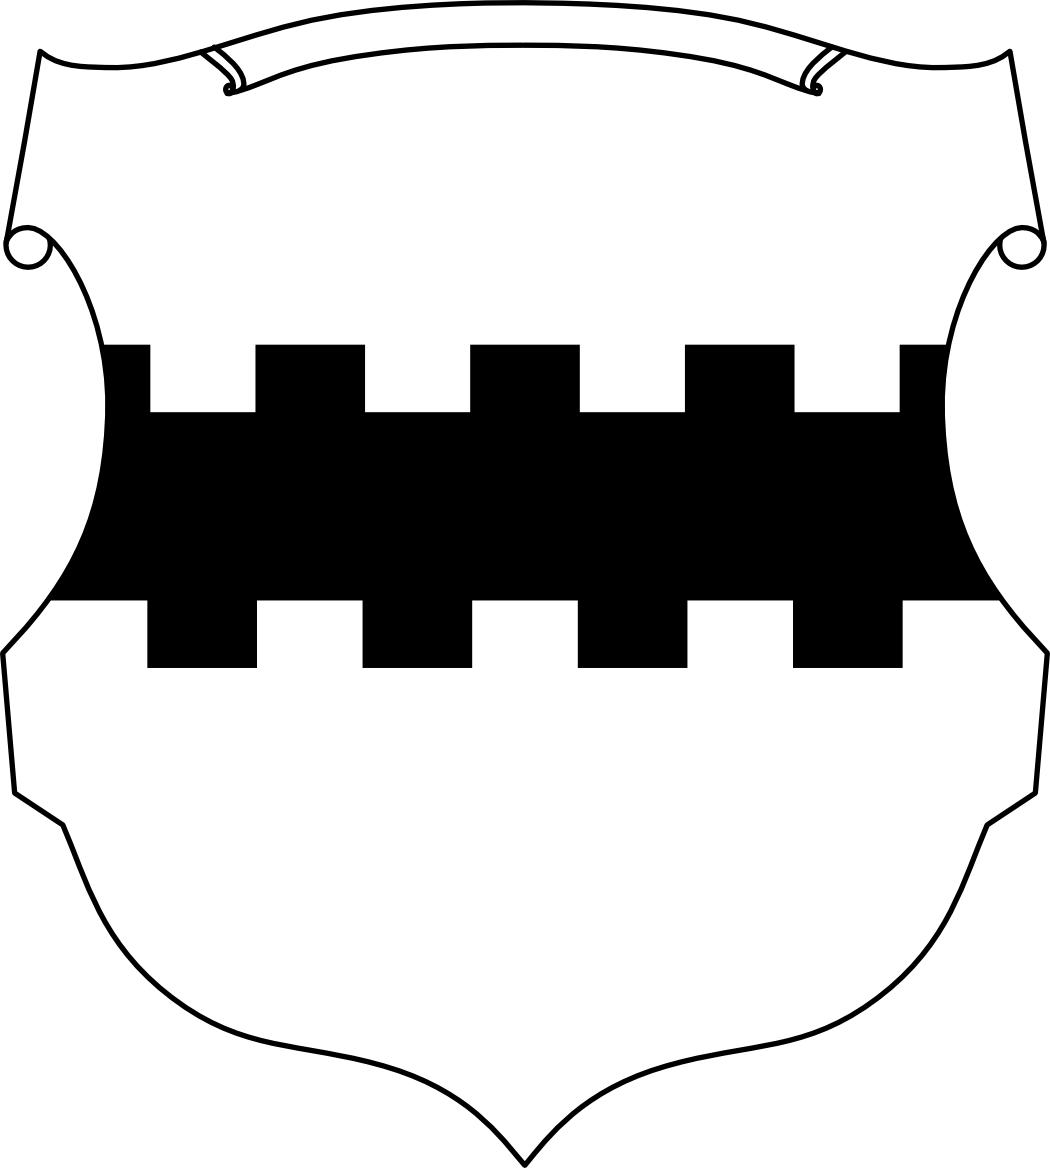 File:Wappenschild Opladen.png.